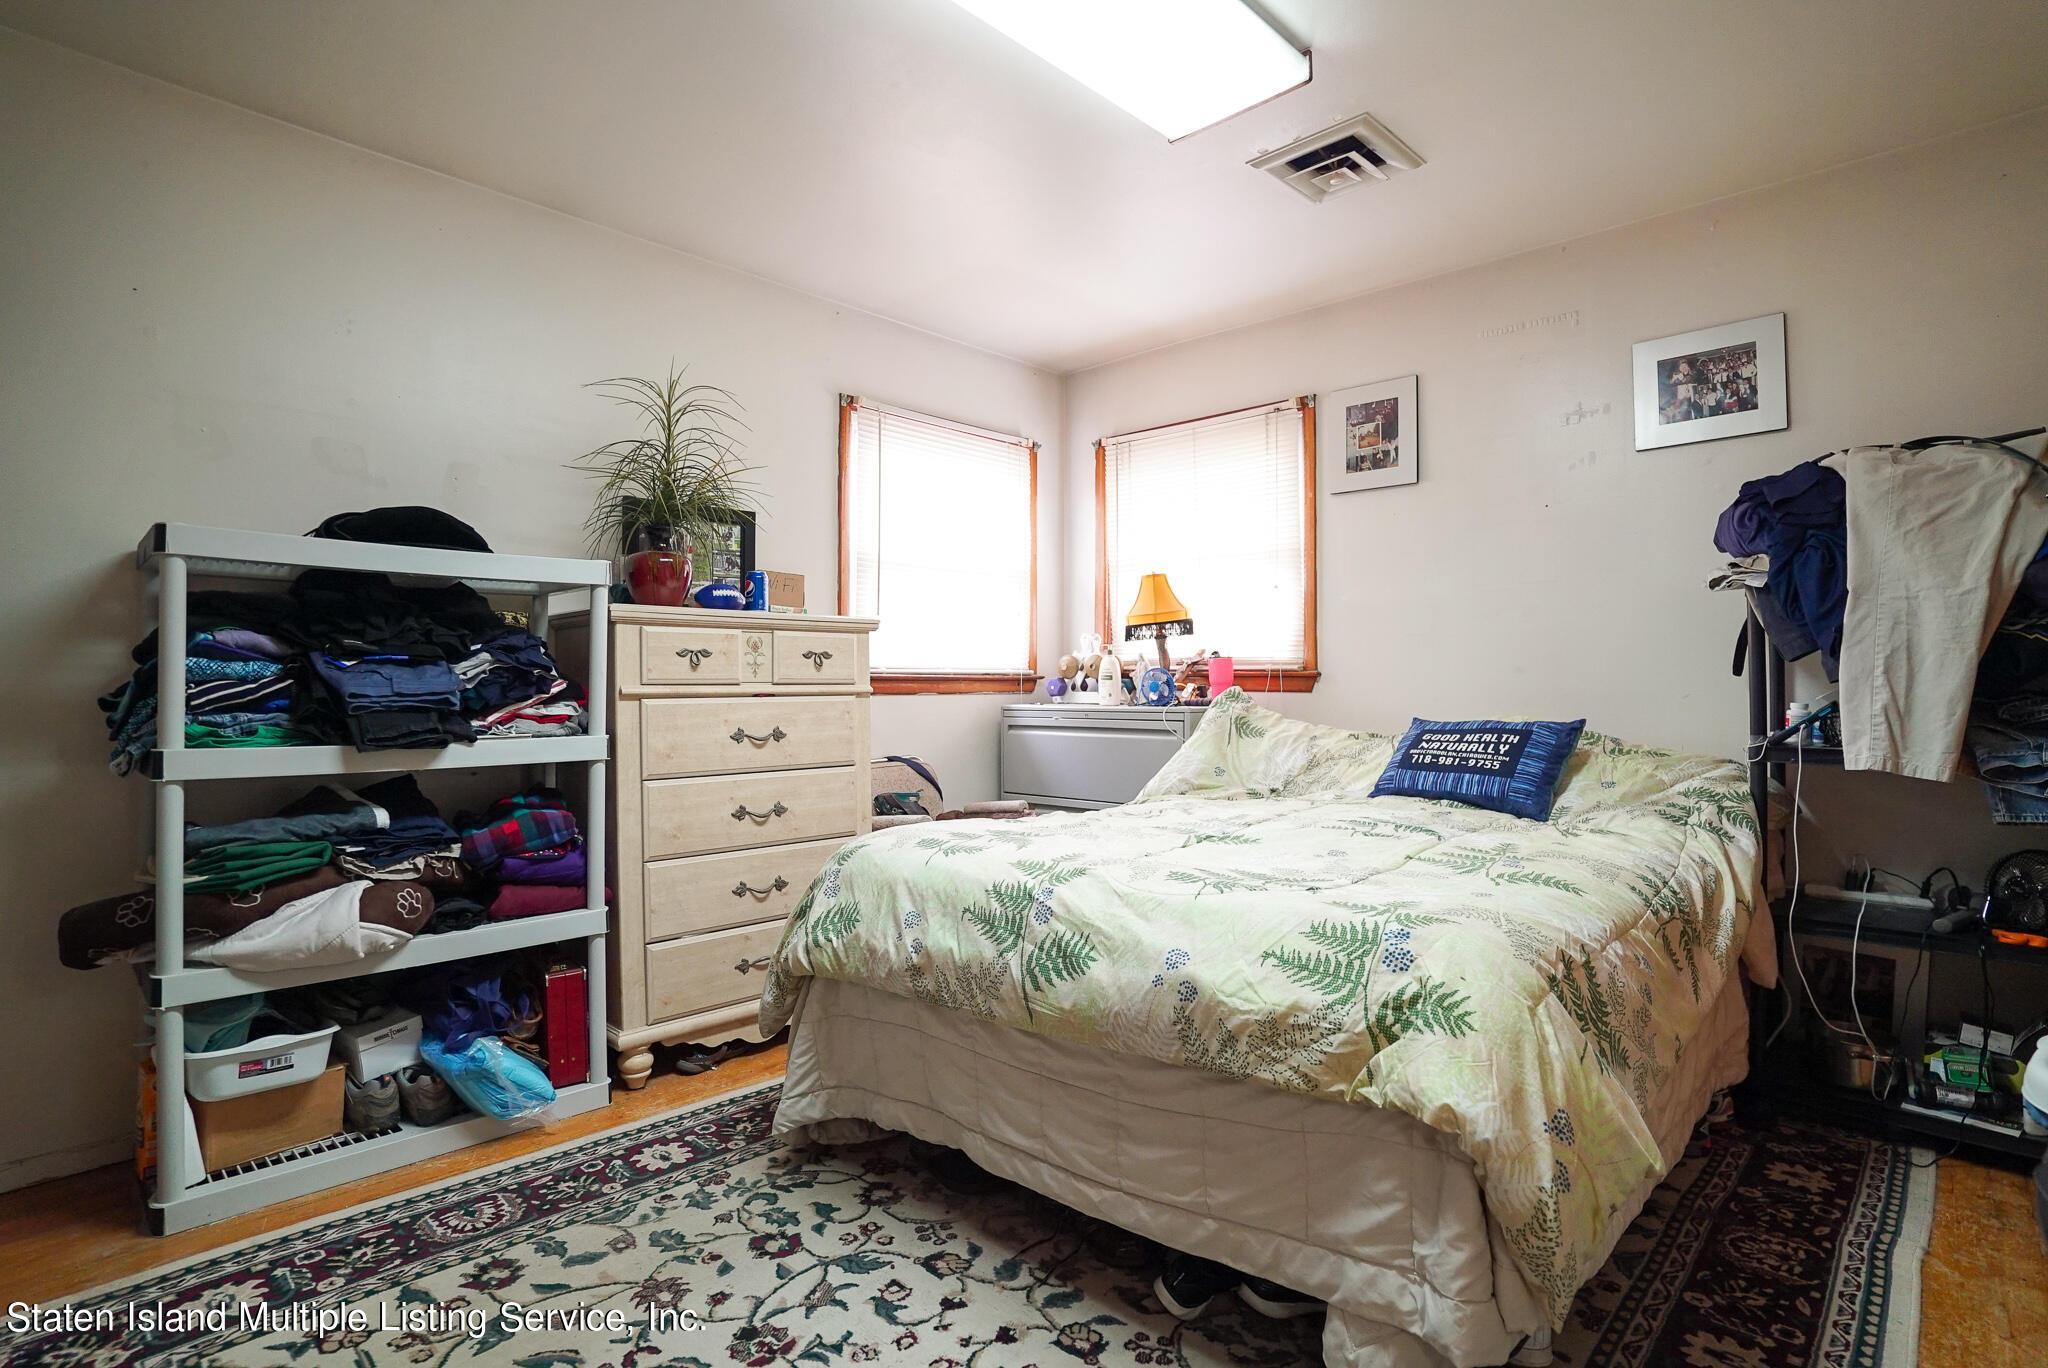 Single Family - Detached 121 Parkinson Avenue  Staten Island, NY 10305, MLS-1147747-18